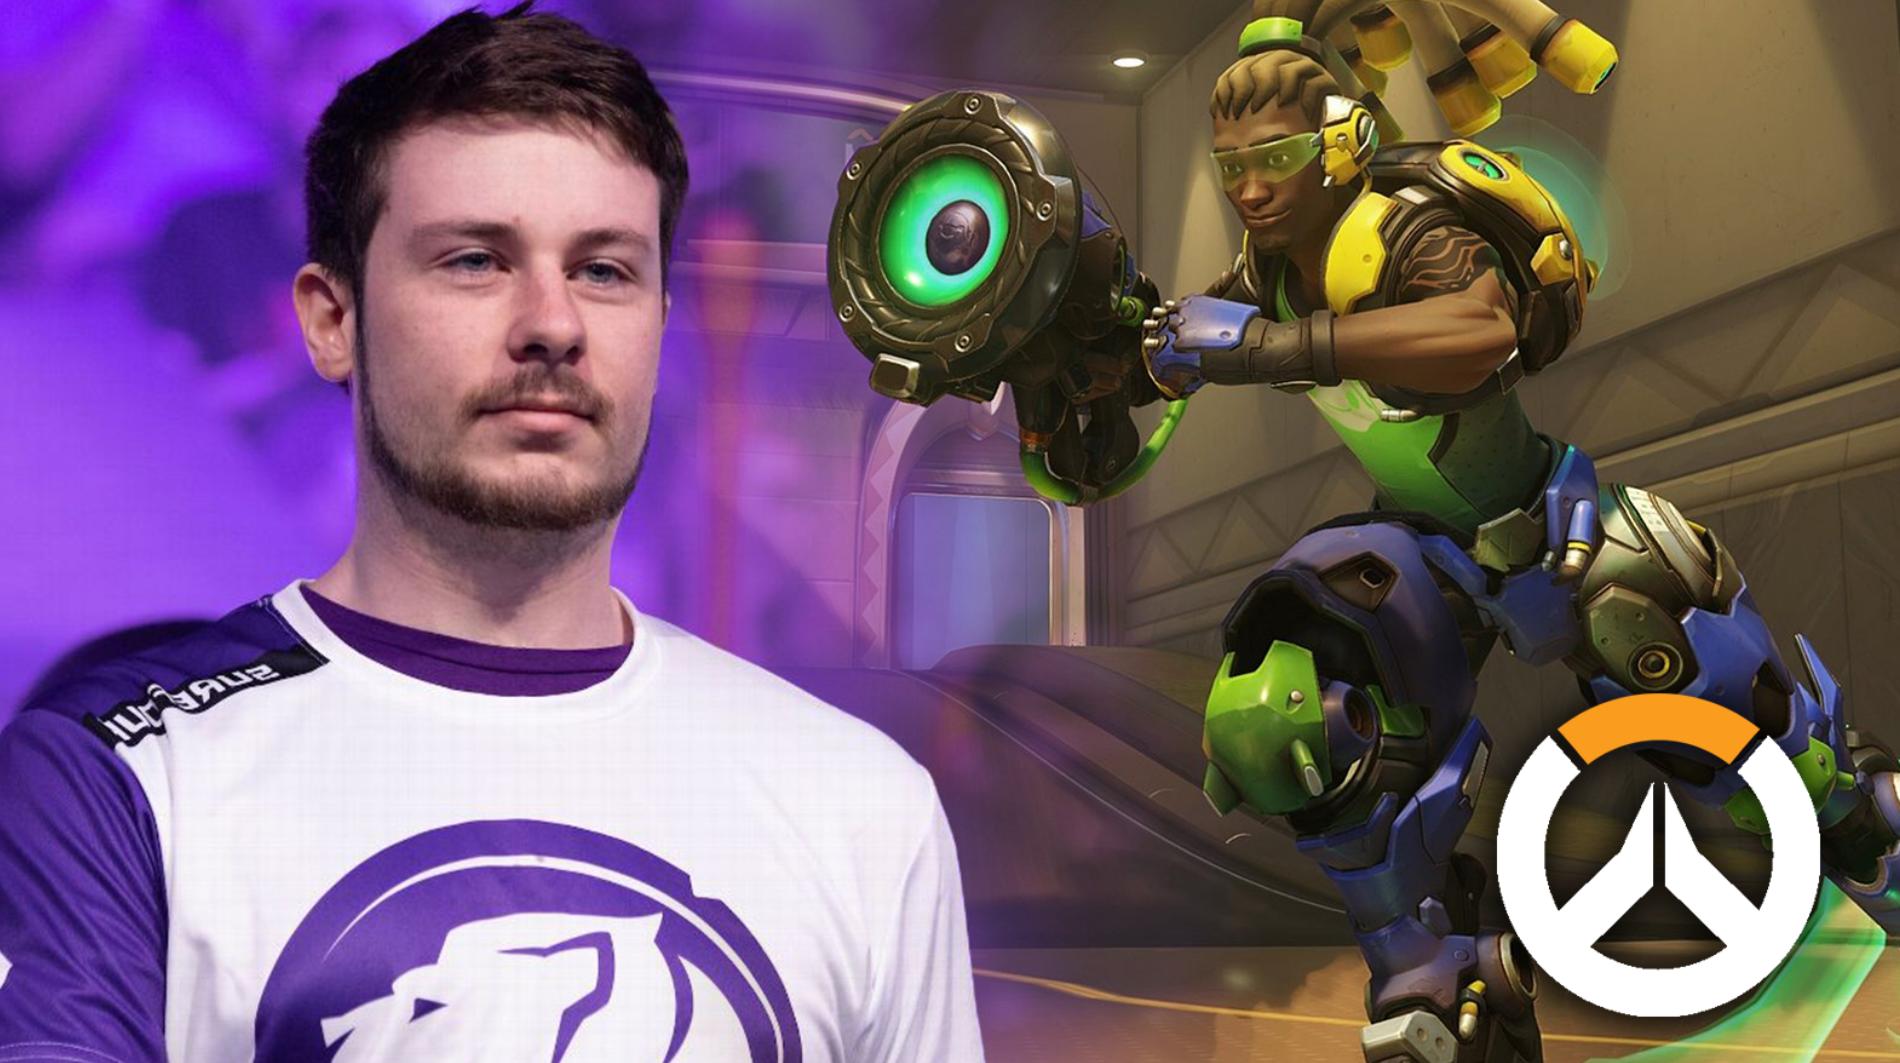 Overwatch League pro Surefour / Overwatch healer Lucio in-game